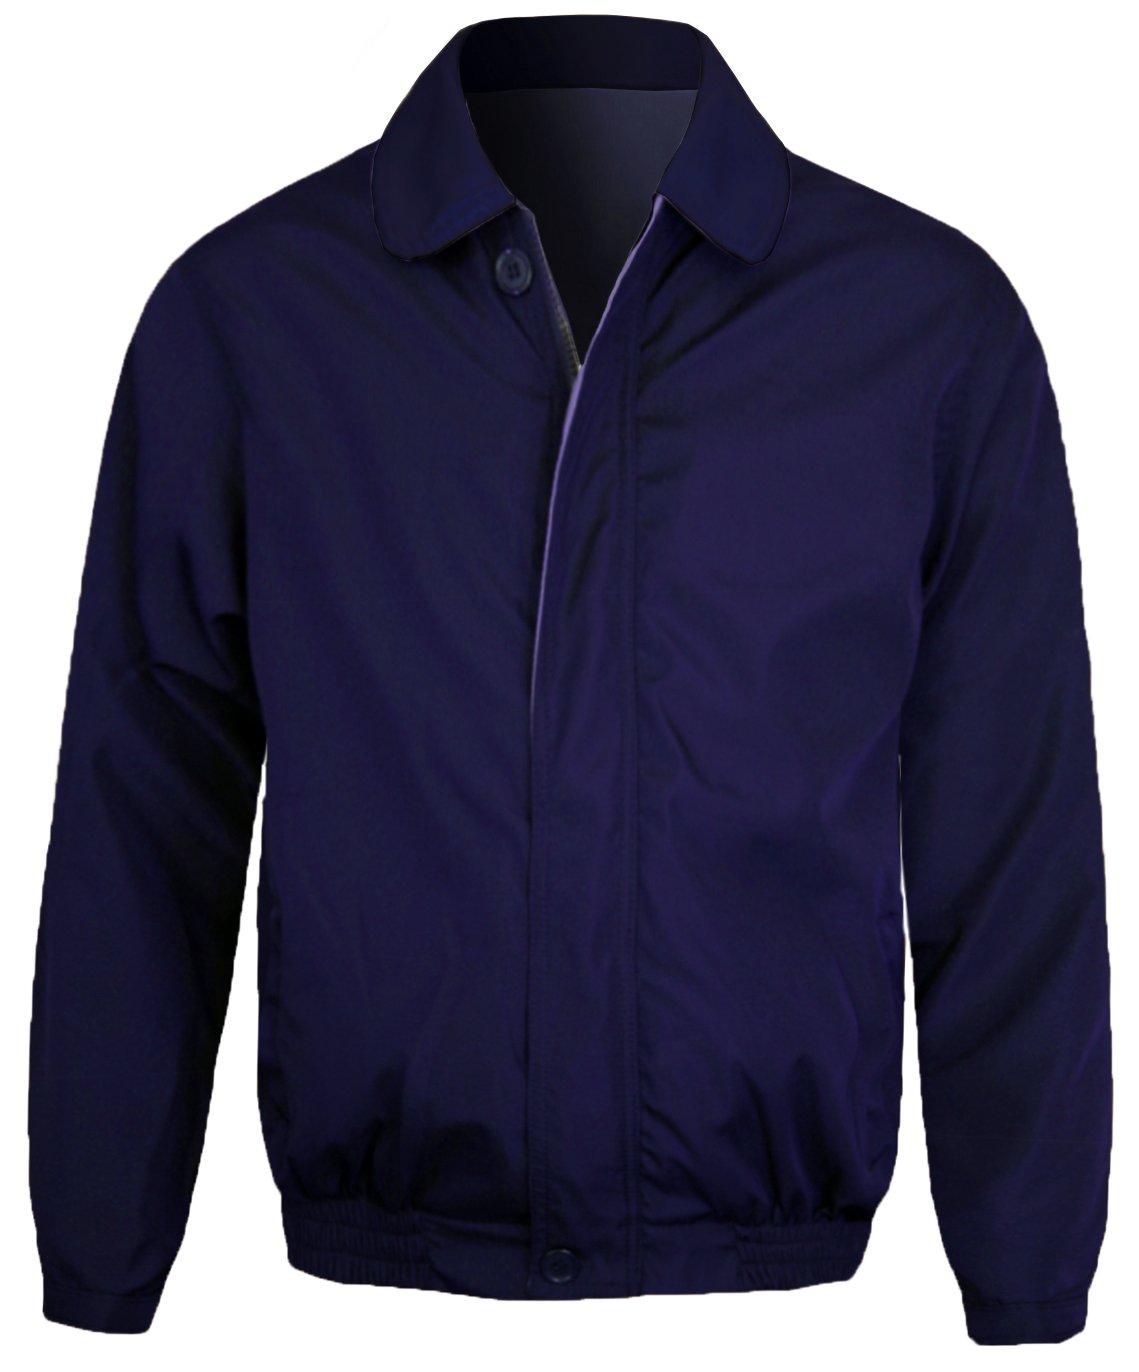 Guytalk Men's Wind and Water Resistant Windbreaker Zipper Closure Golf Jacket 3XL Navy